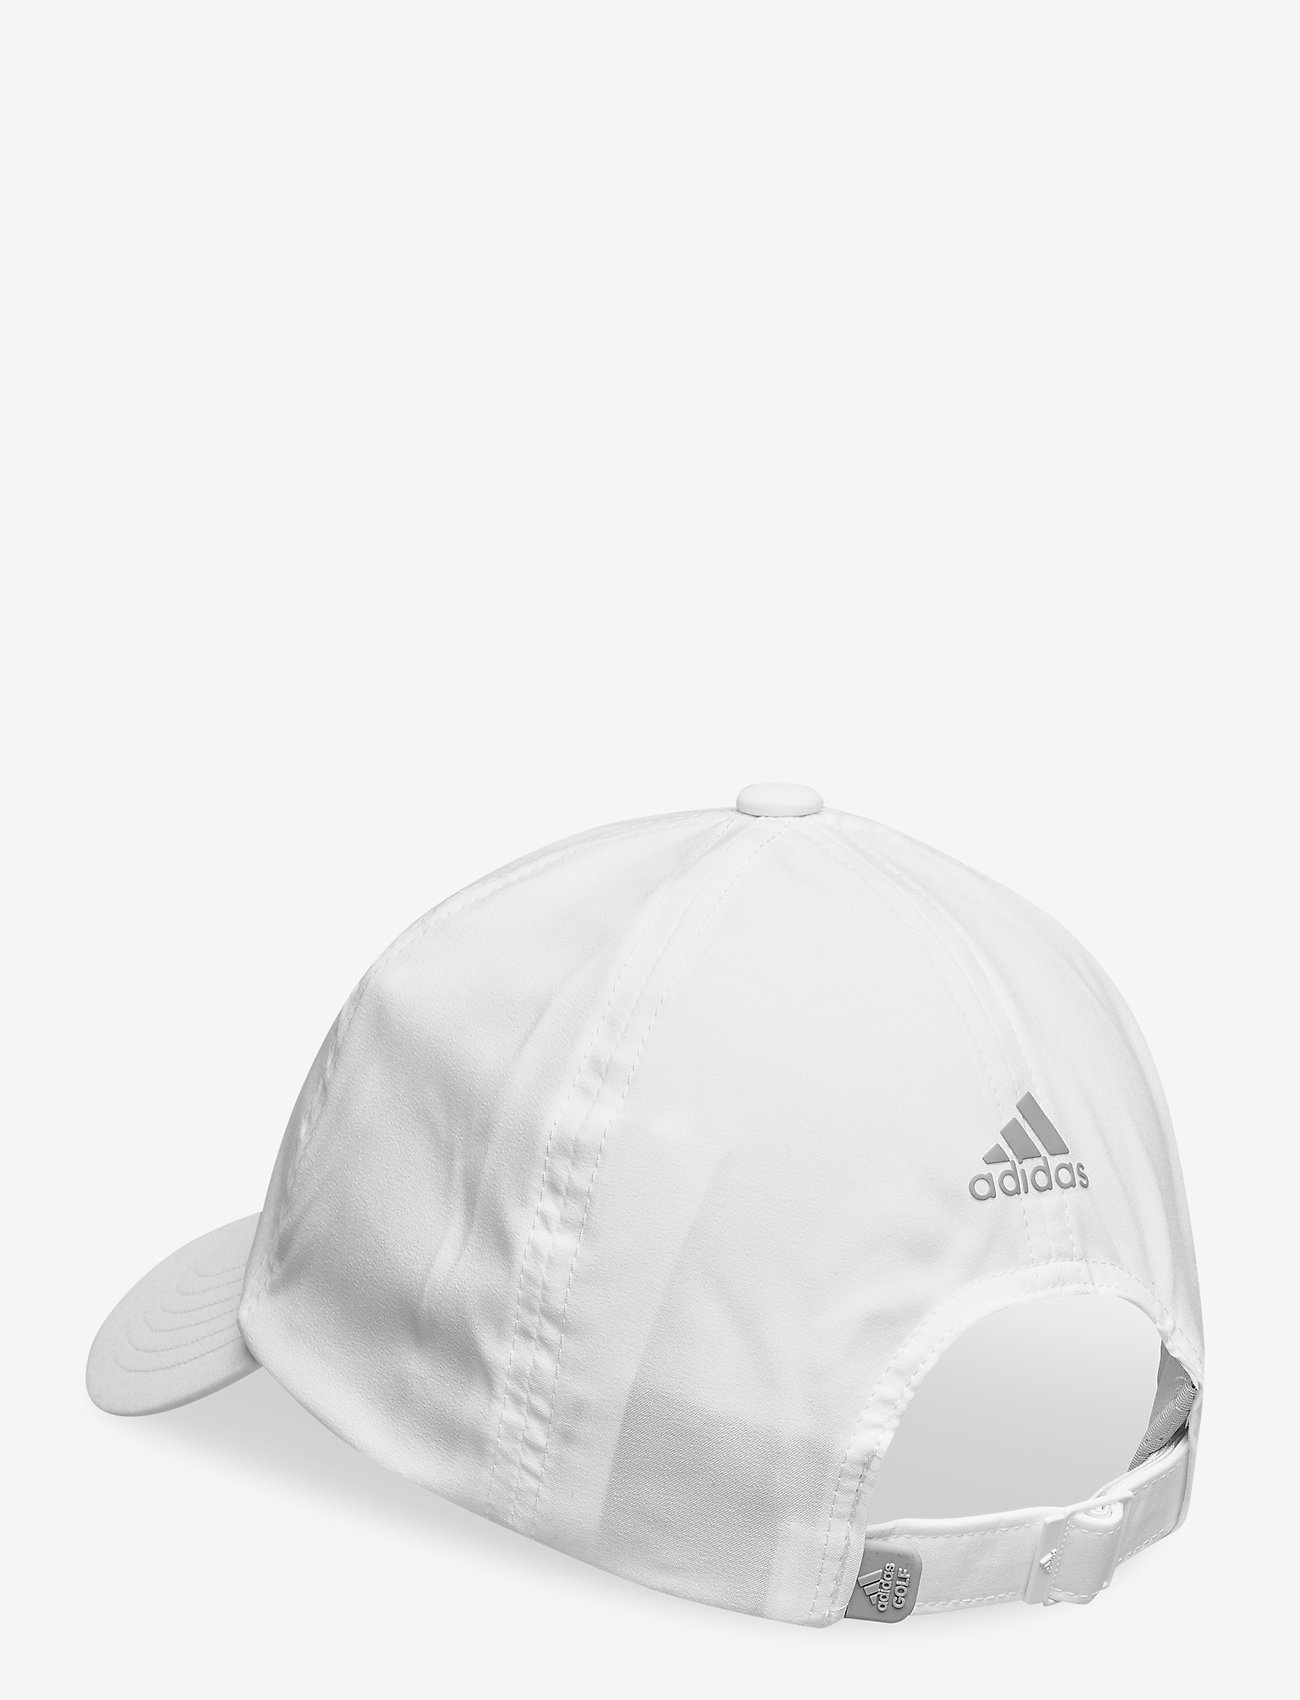 adidas Golf - W BLANK CAP - caps - white - 1